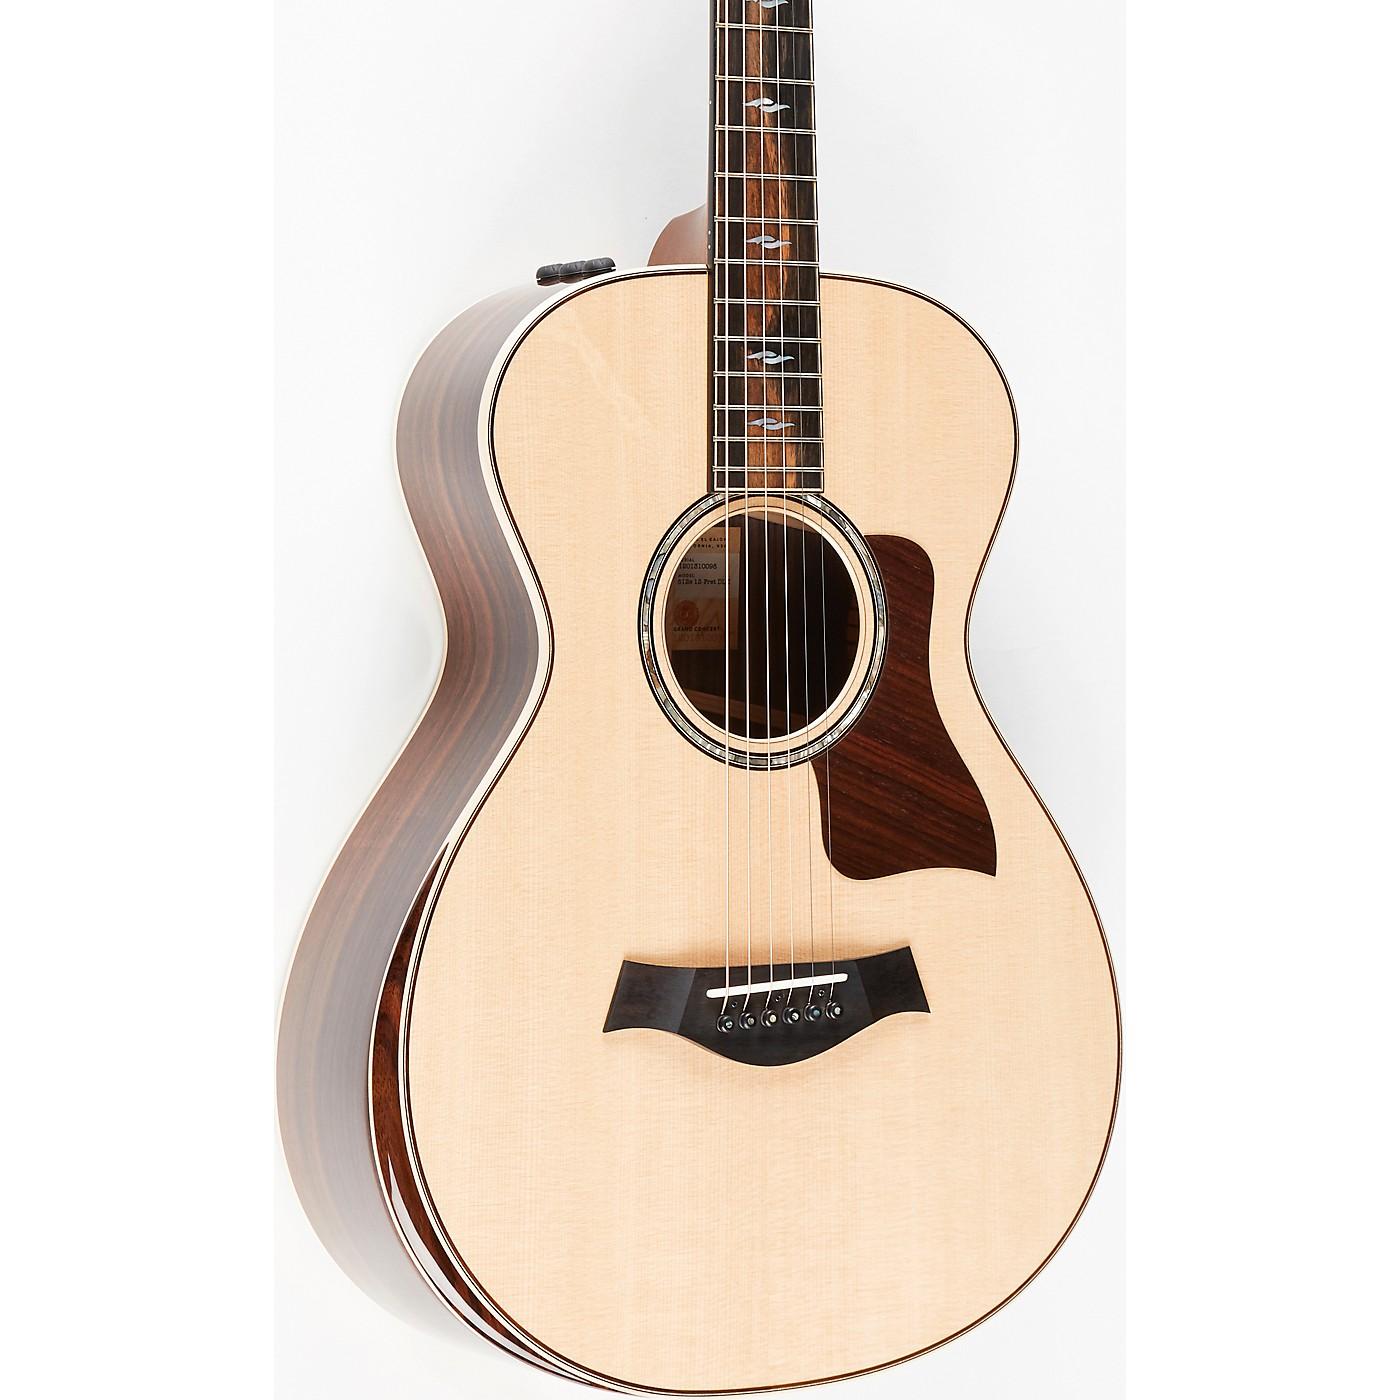 Taylor 812e Deluxe Grand Concert Acoustic-Electric Guitar thumbnail